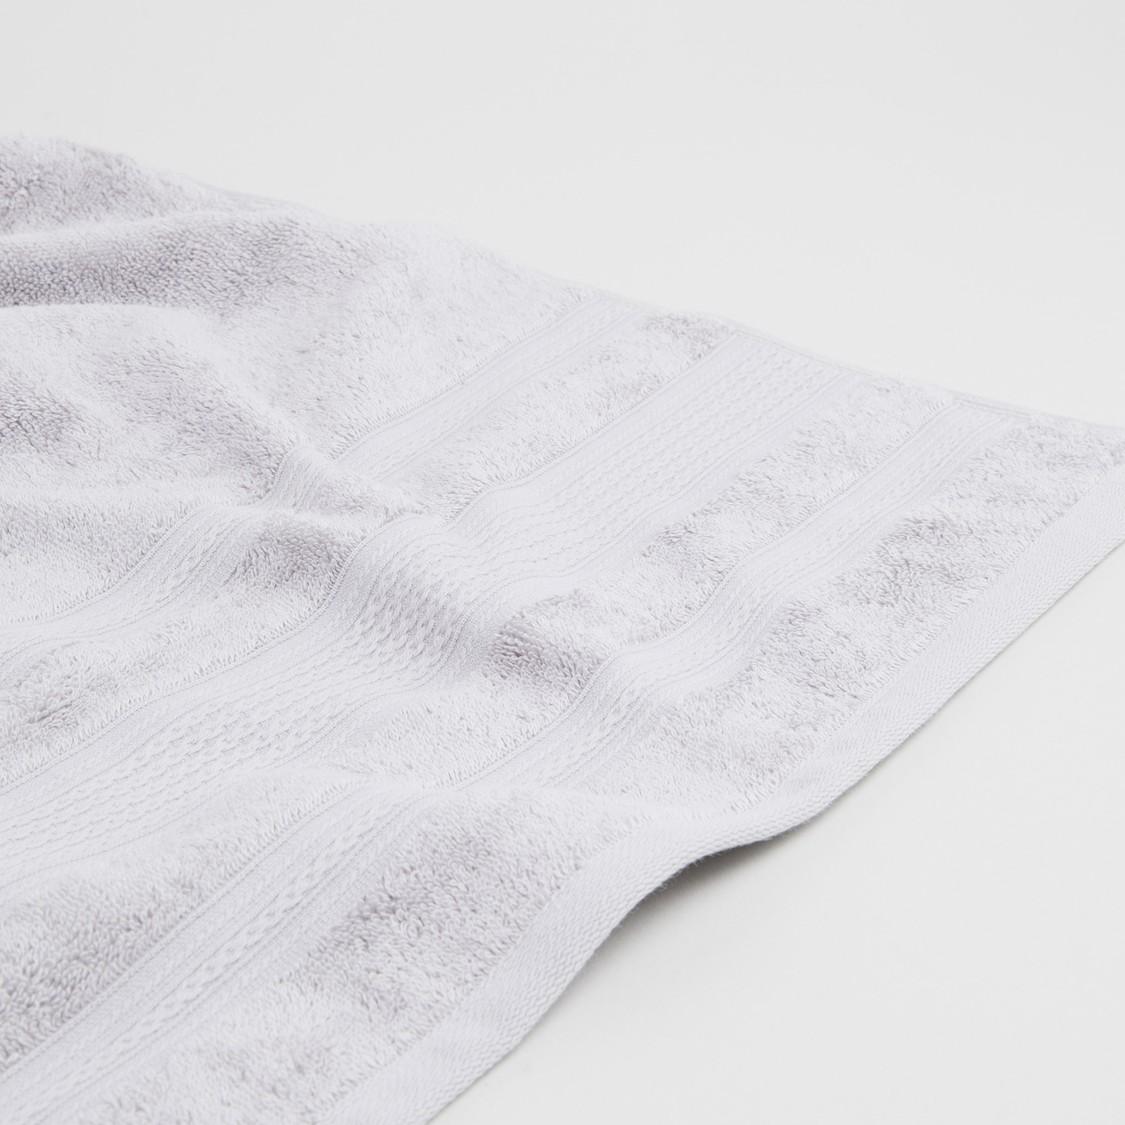 Rectangular Bath Towel - 140x70 cms